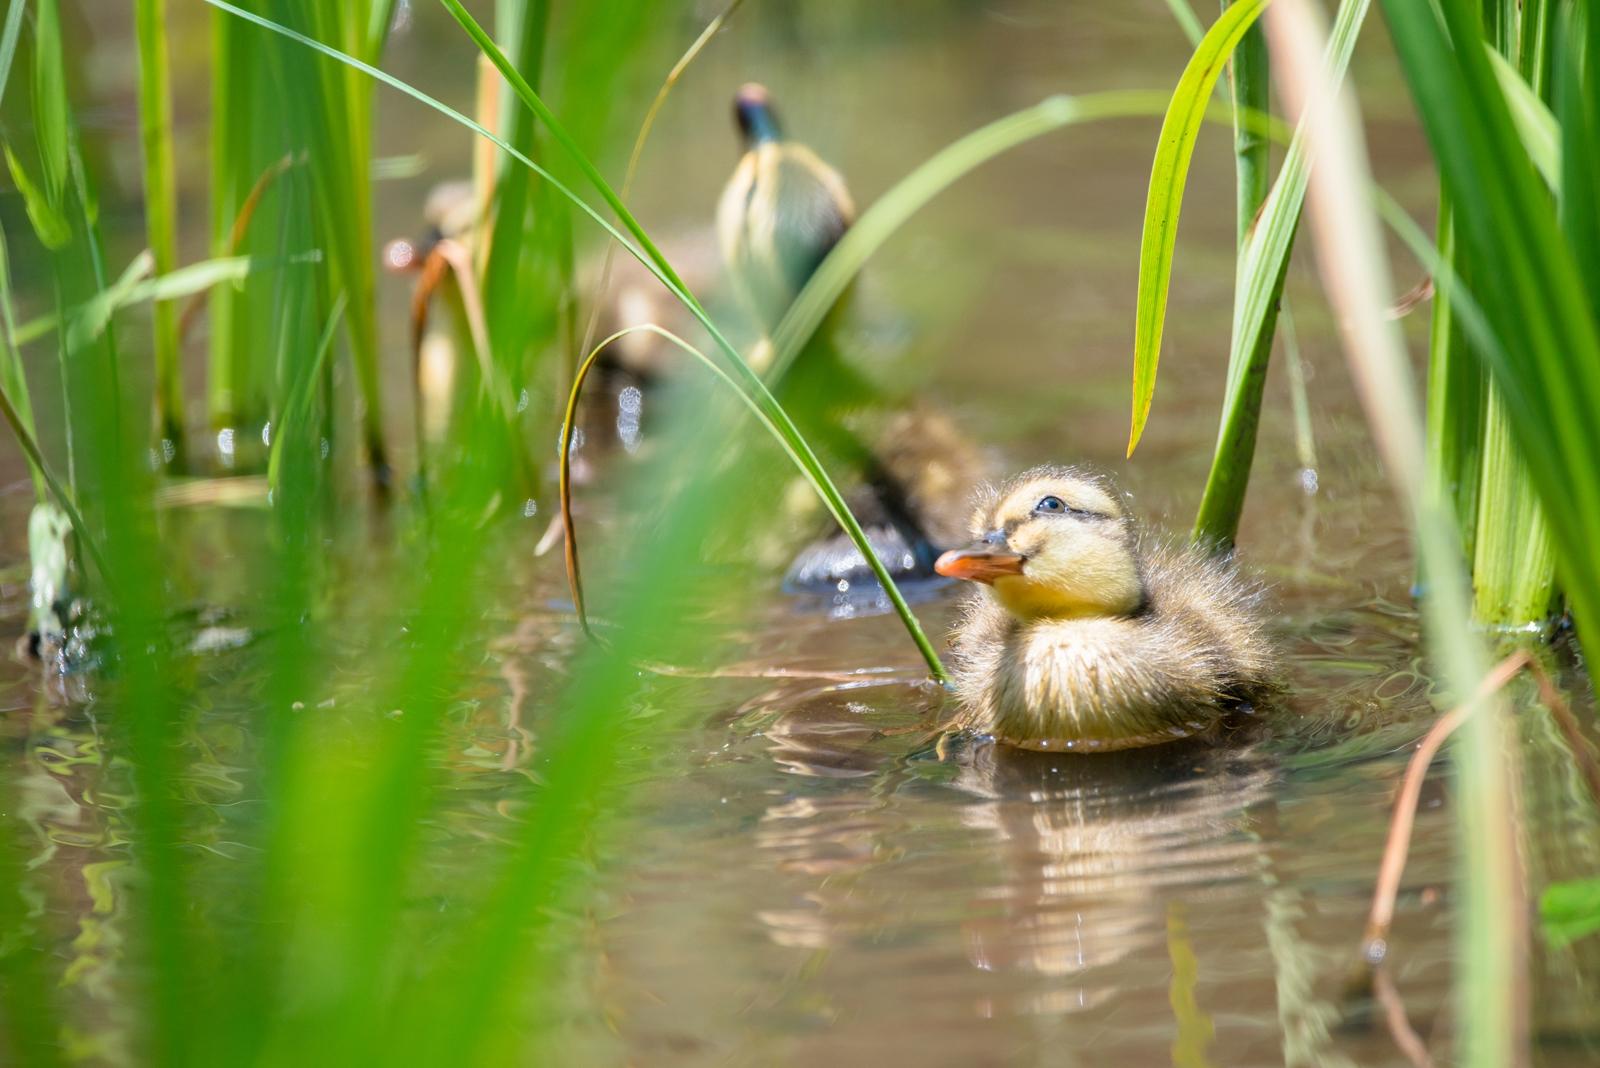 Photo: 楽しい探検 Fun exploratory play.  茂みの中を わくわく探検 あれもこれも まわりは気になるものばかり  Baby of spot-billed duck. (カルガモの赤ちゃん)  #birdphotography #birds #cooljapan #kawaii #nikon #sigma  Nikon D800E SIGMA 150-600mm F5-6.3 DG OS HSM Contemporary  ・小鳥の詩朗読 /poetry reading https://youtu.be/i0tW-x1Nr-s?list=PL2YtHGm0-R3qVsaqvQe9OYdJFCkI98wzF